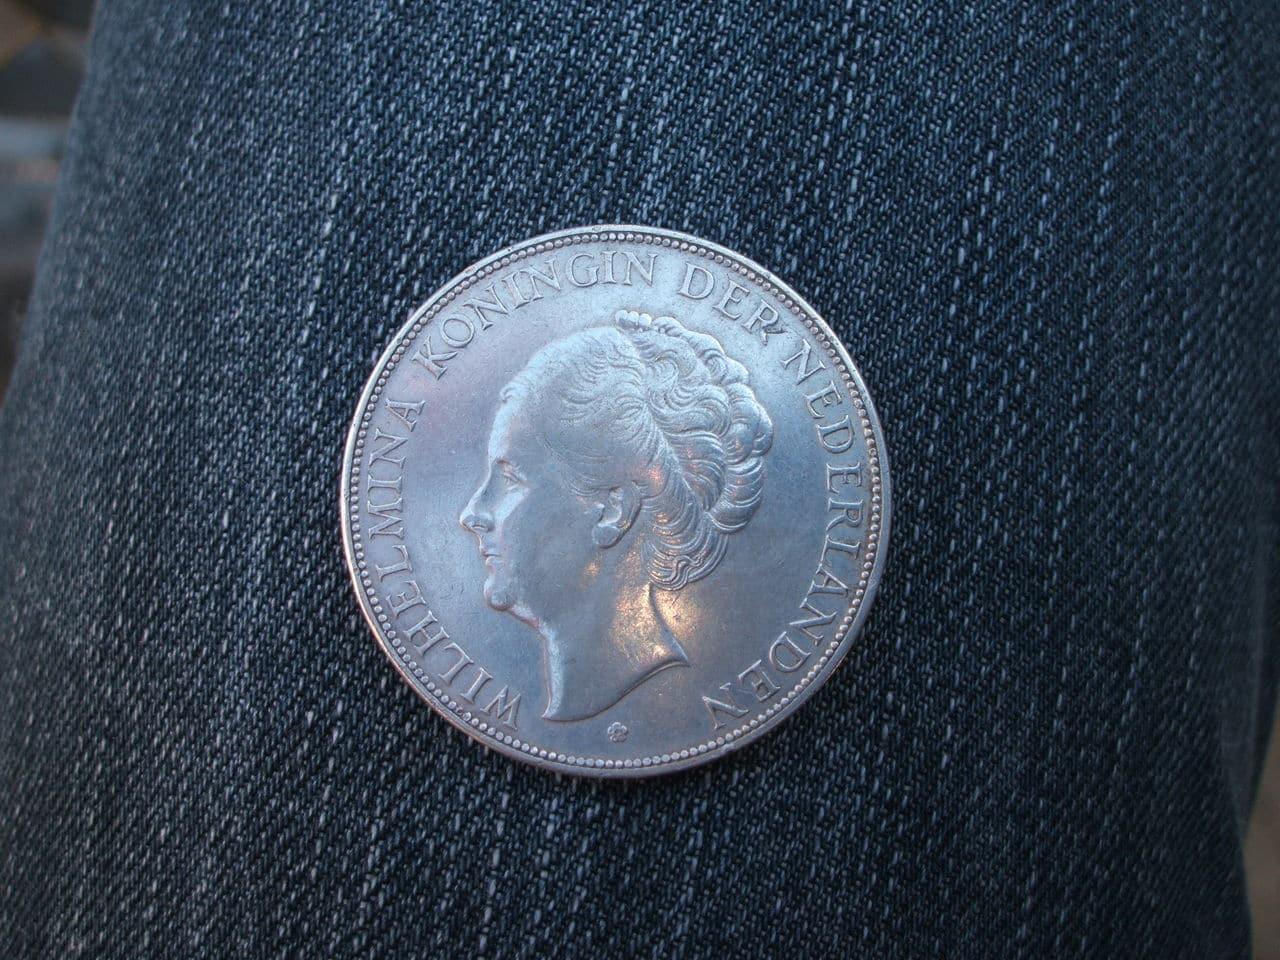 2 1/2 Gulden. Holanda. 1930  001